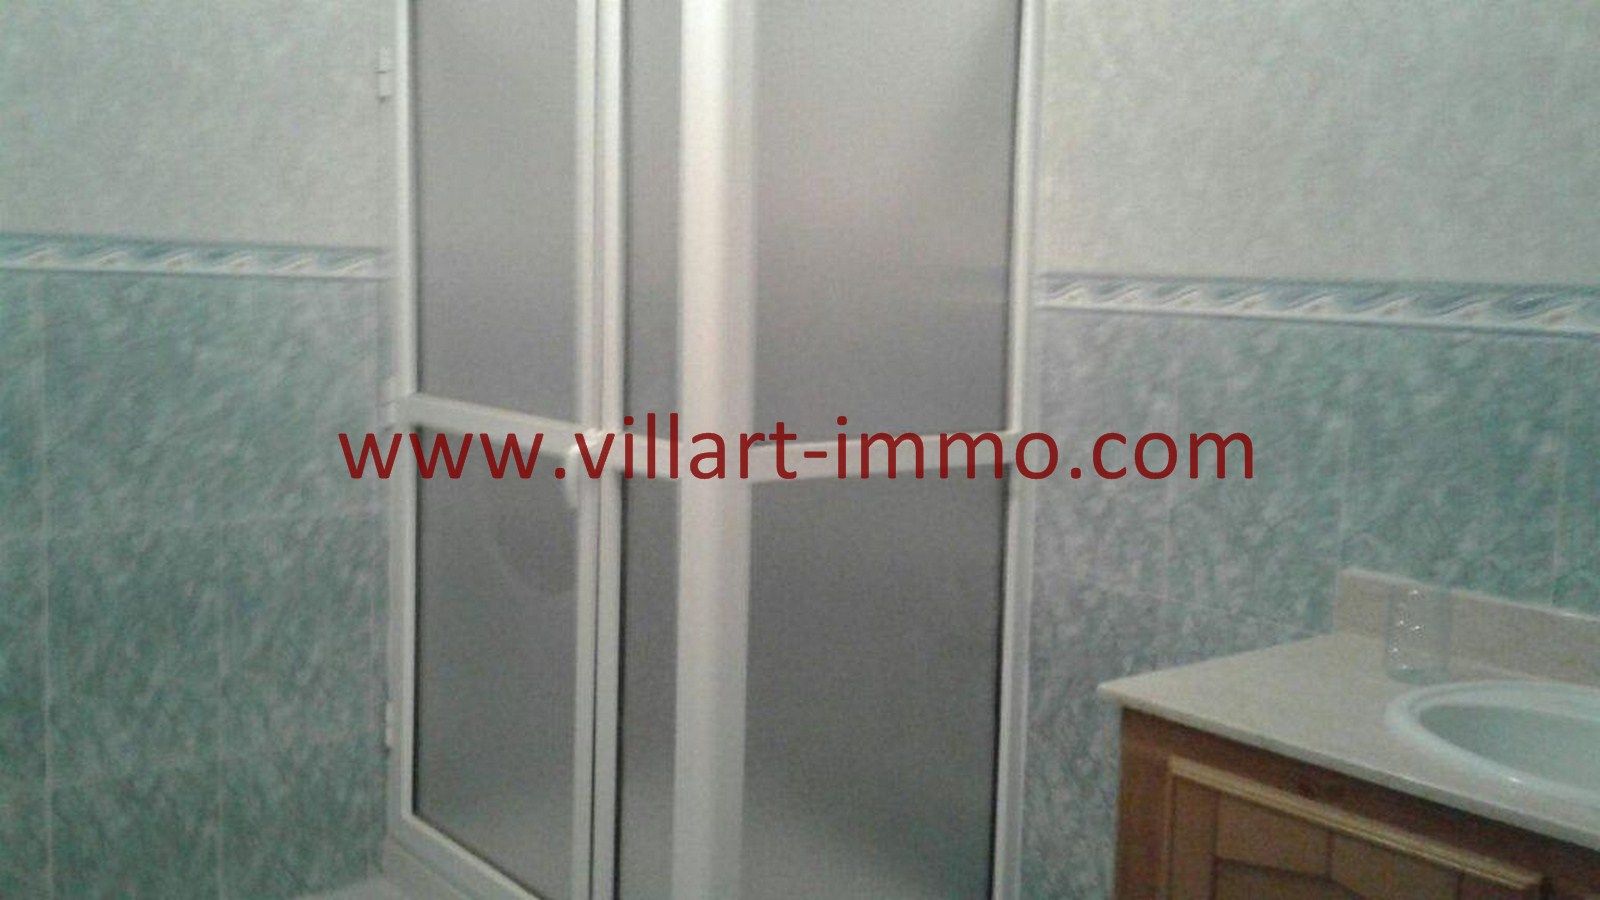 6-Vente-Maison-Tanger-Mojahidine -Salle De Bain 2-VM500-Villart Immo